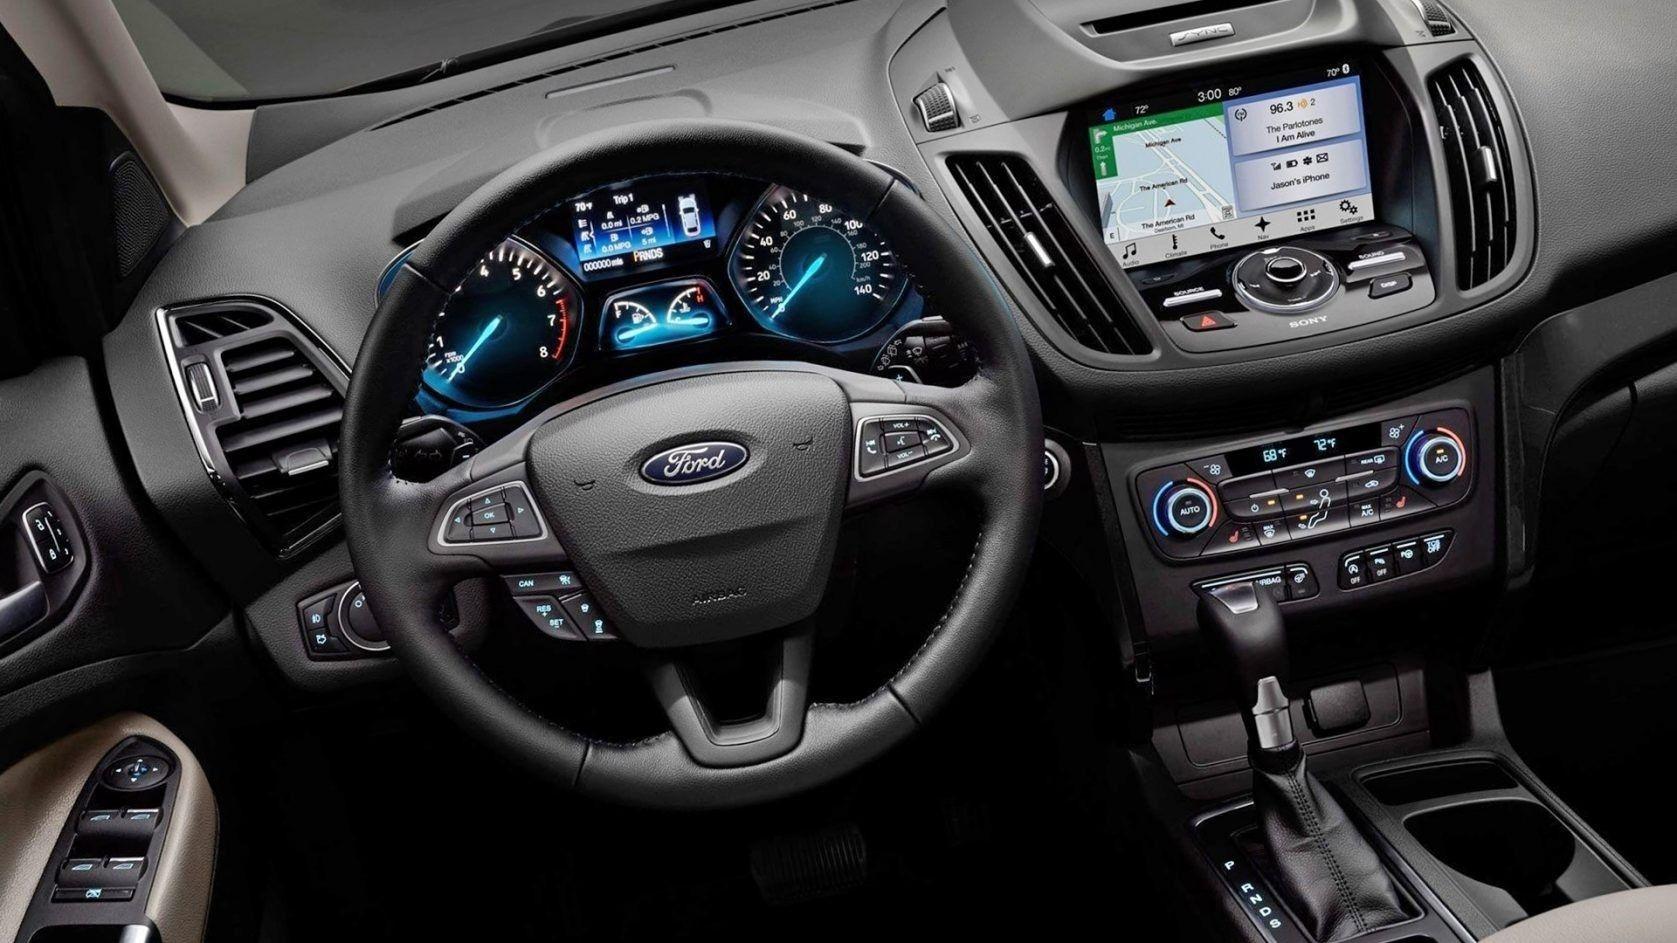 2019 Ford Kuga Price Ford Focus Hatchback Ford Focus Sedan Ford Focus